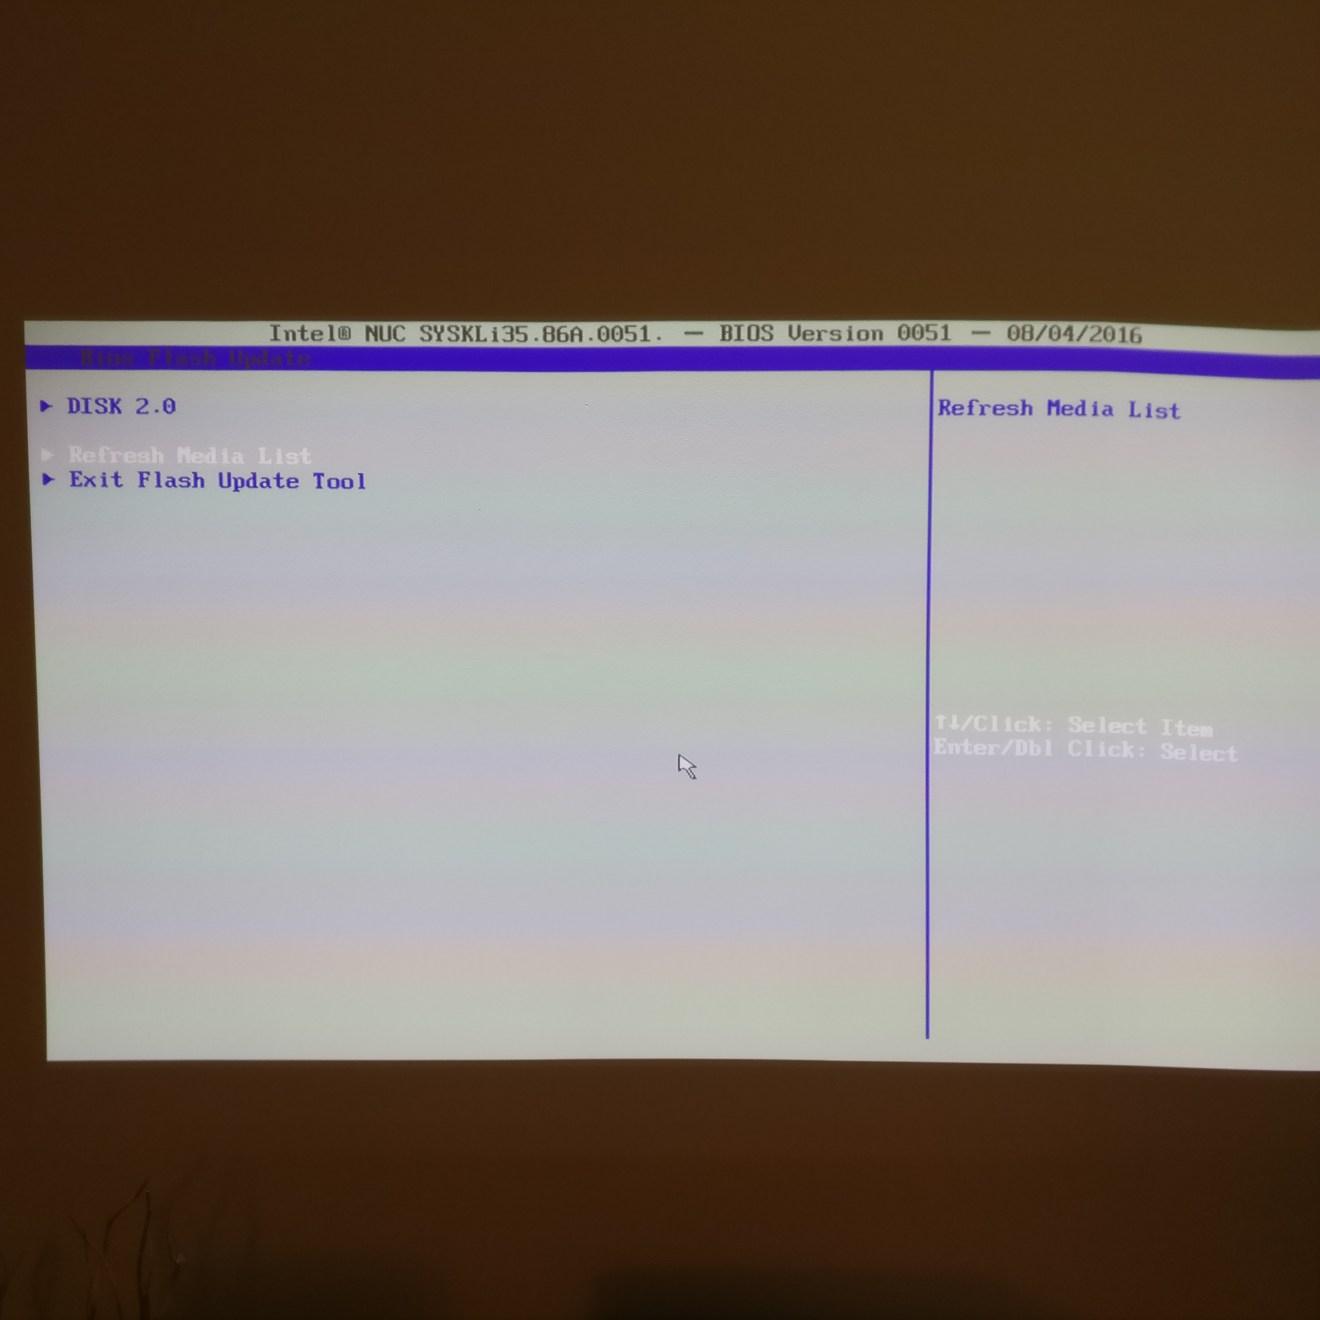 domalab.com Intel NUC BIOS disk list